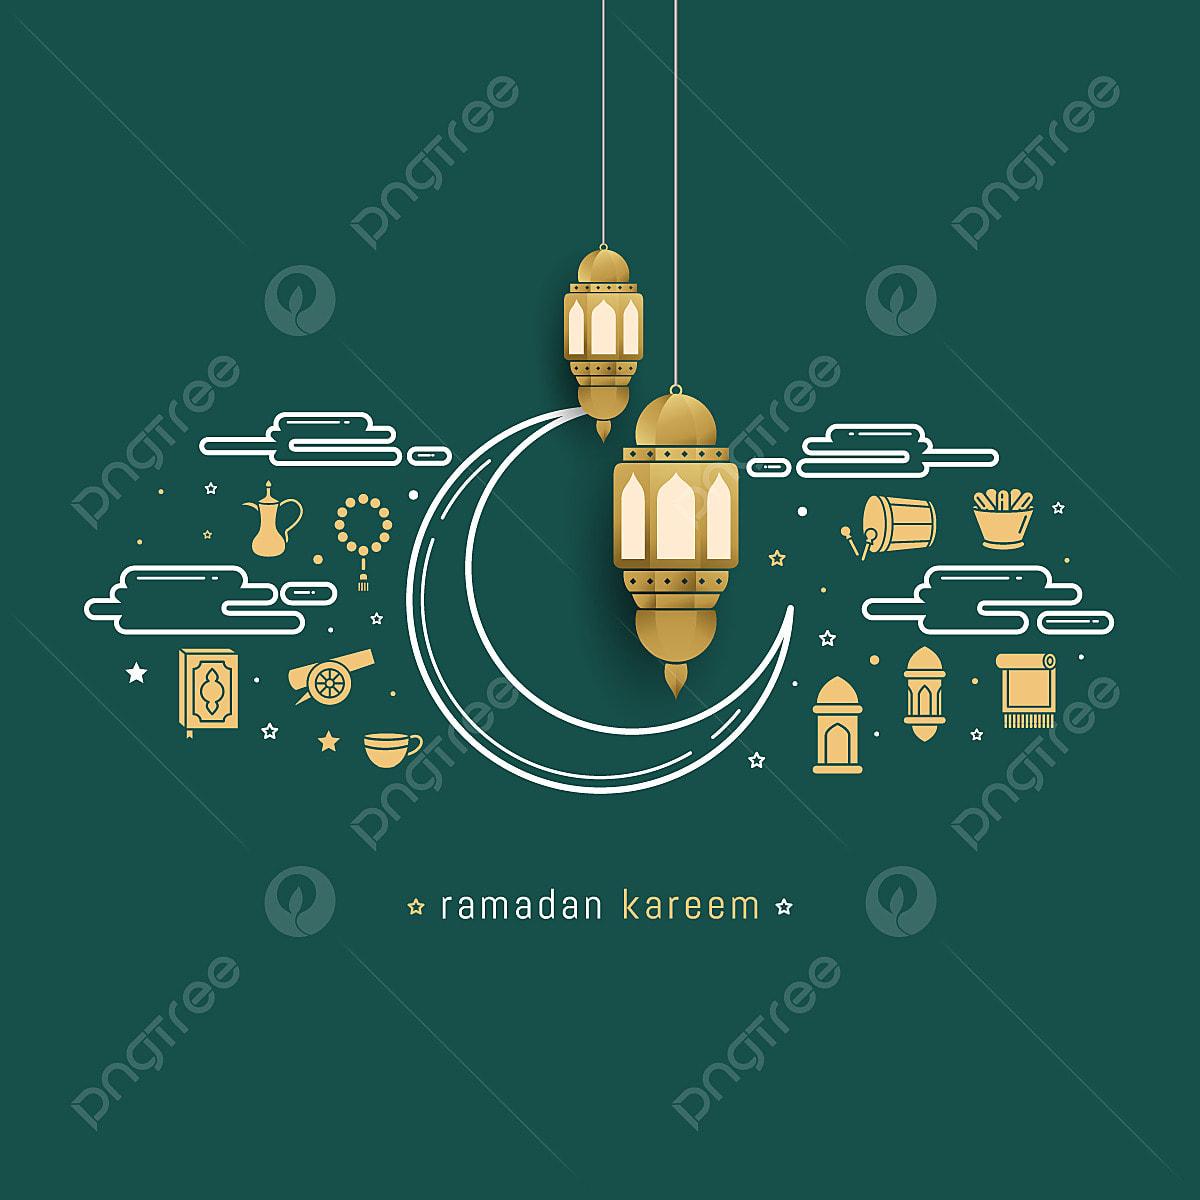 Ramadan Kareem Islamic Greeting Card Template Design